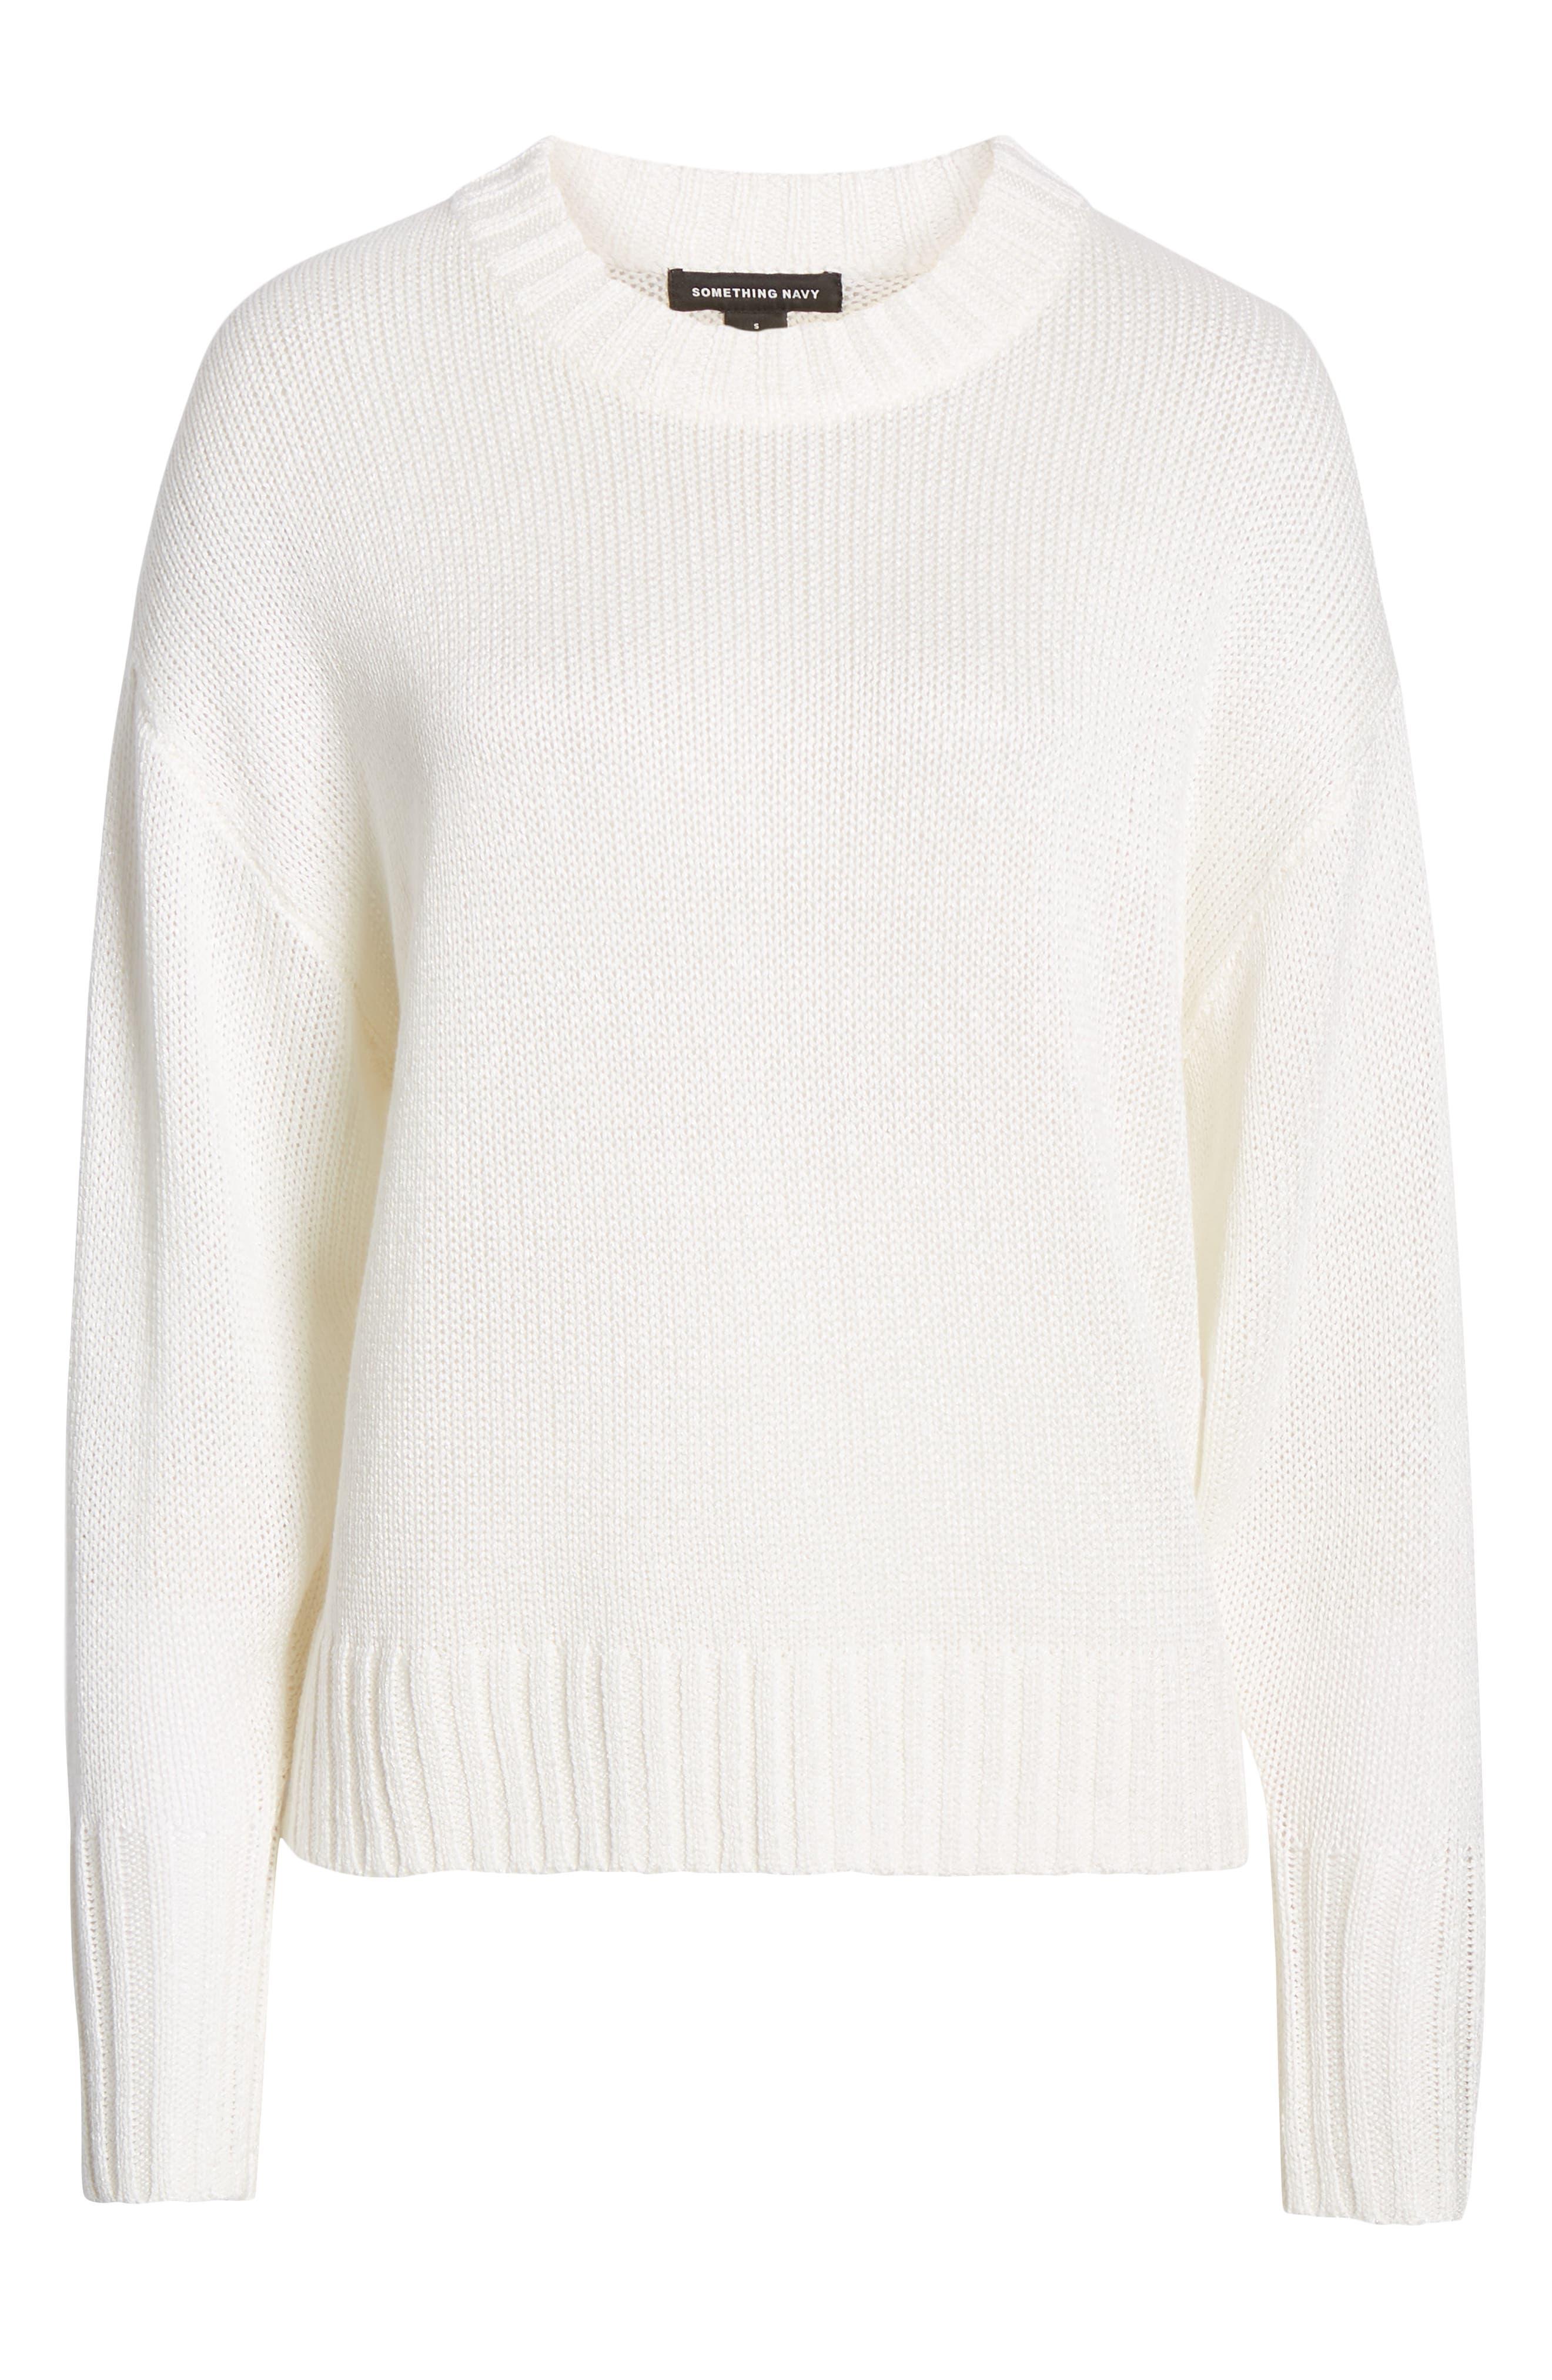 SOMETHING NAVY,                             Subtle Sheen Sweater,                             Alternate thumbnail 8, color,                             100